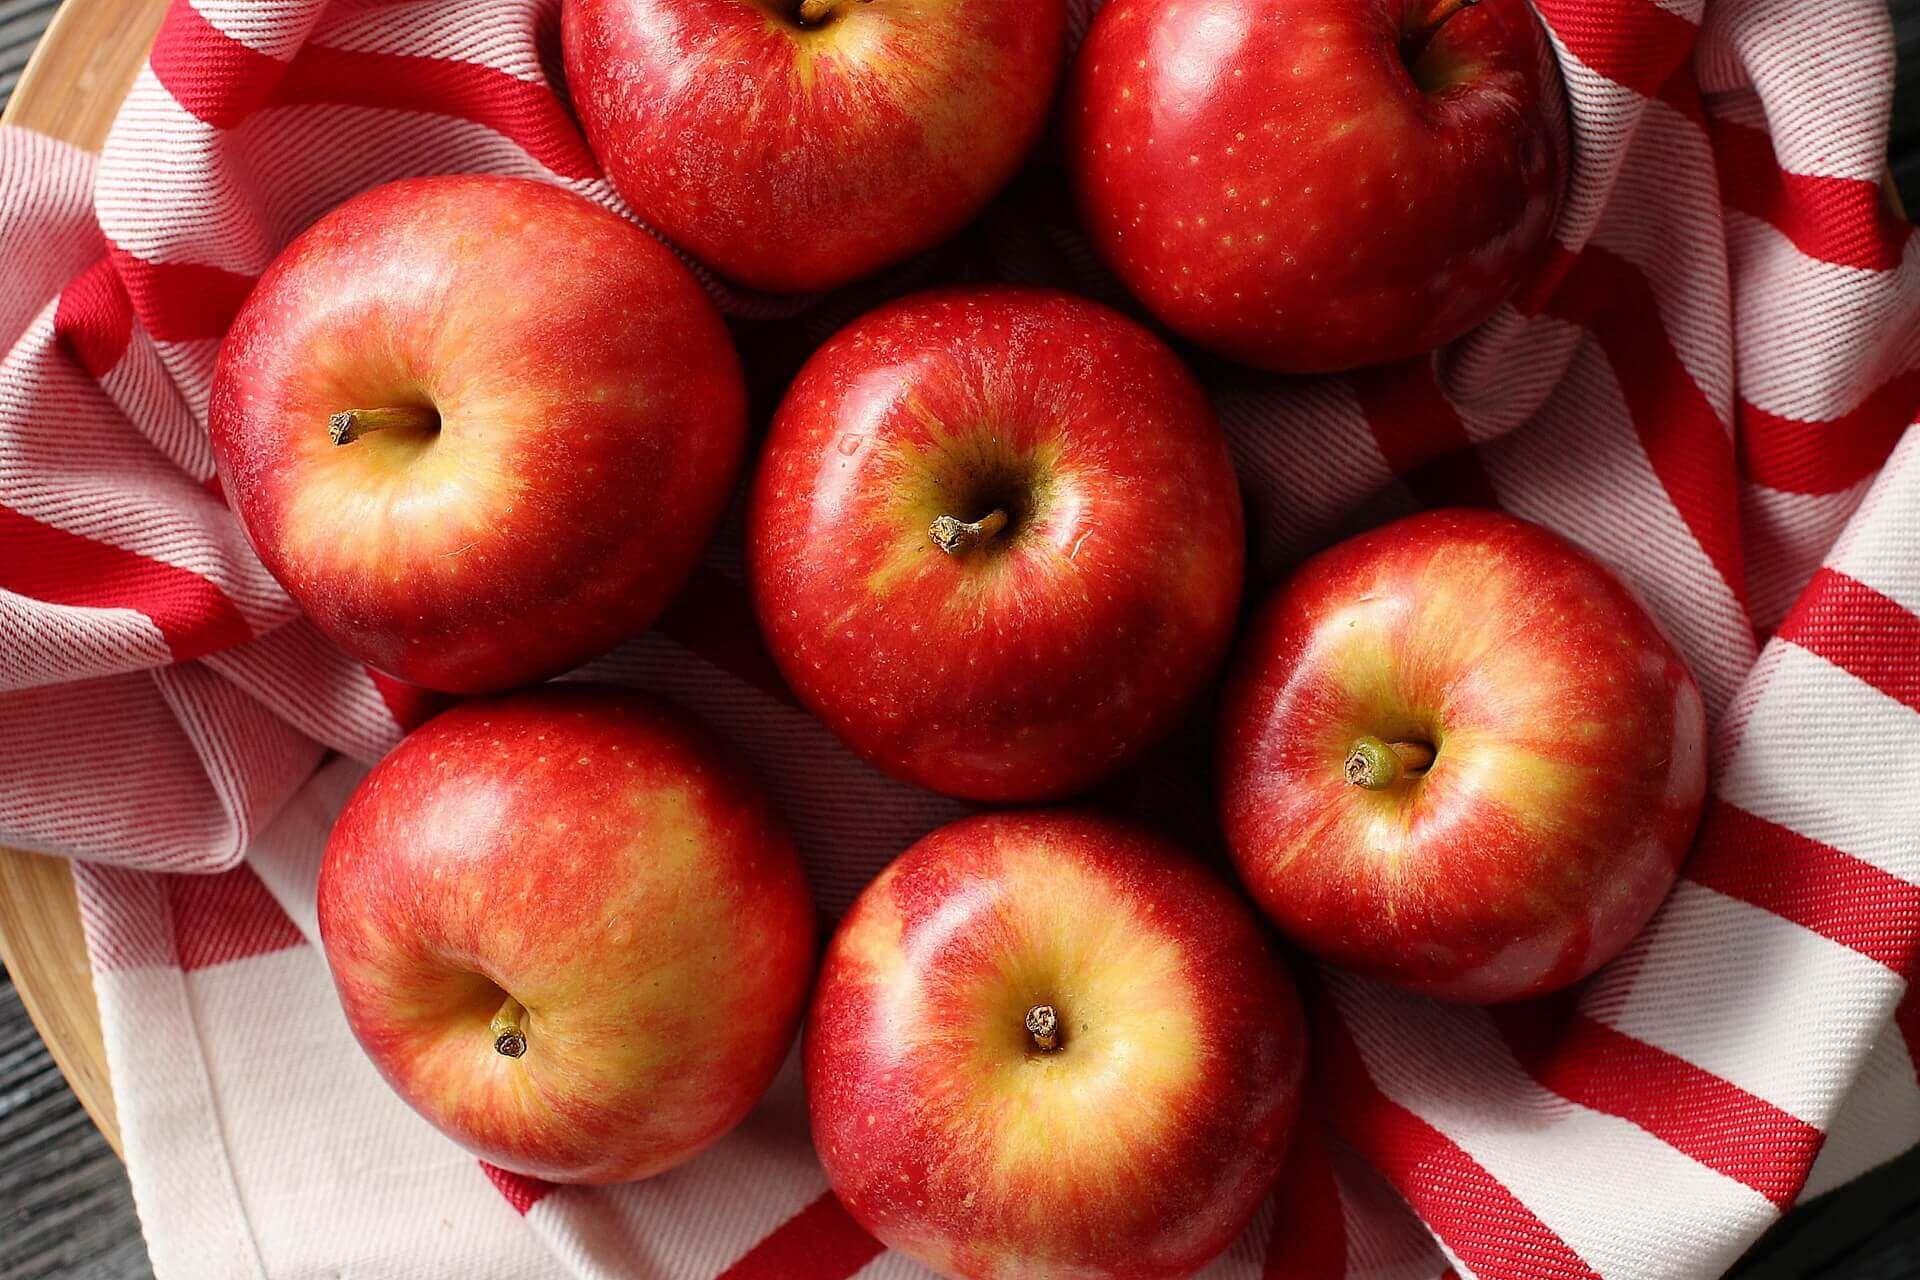 وصفات التفاح وجبات خفيفة وسريعة Applesfromeurope Eu Apple Europe Photos Community Events